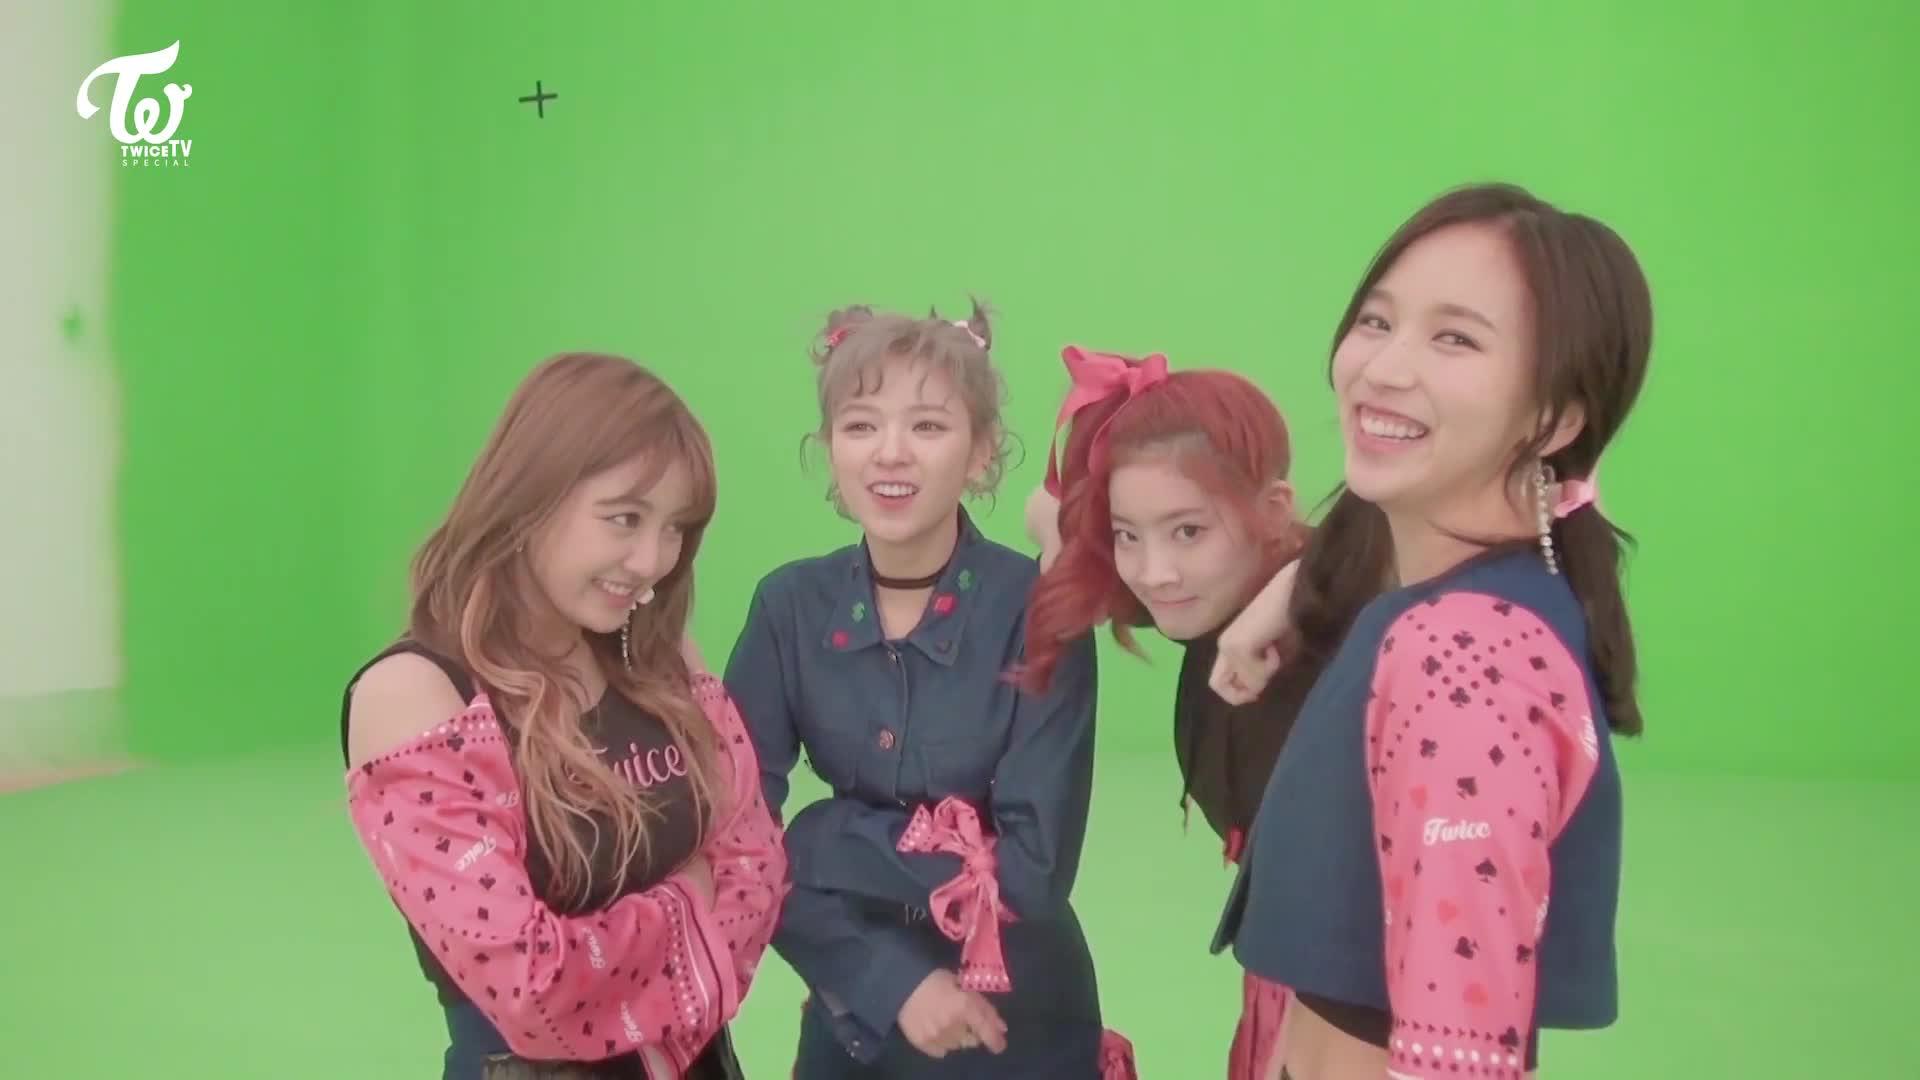 dahyun, jeongyeon, jihyo, kpop, twice, Twice GIFs